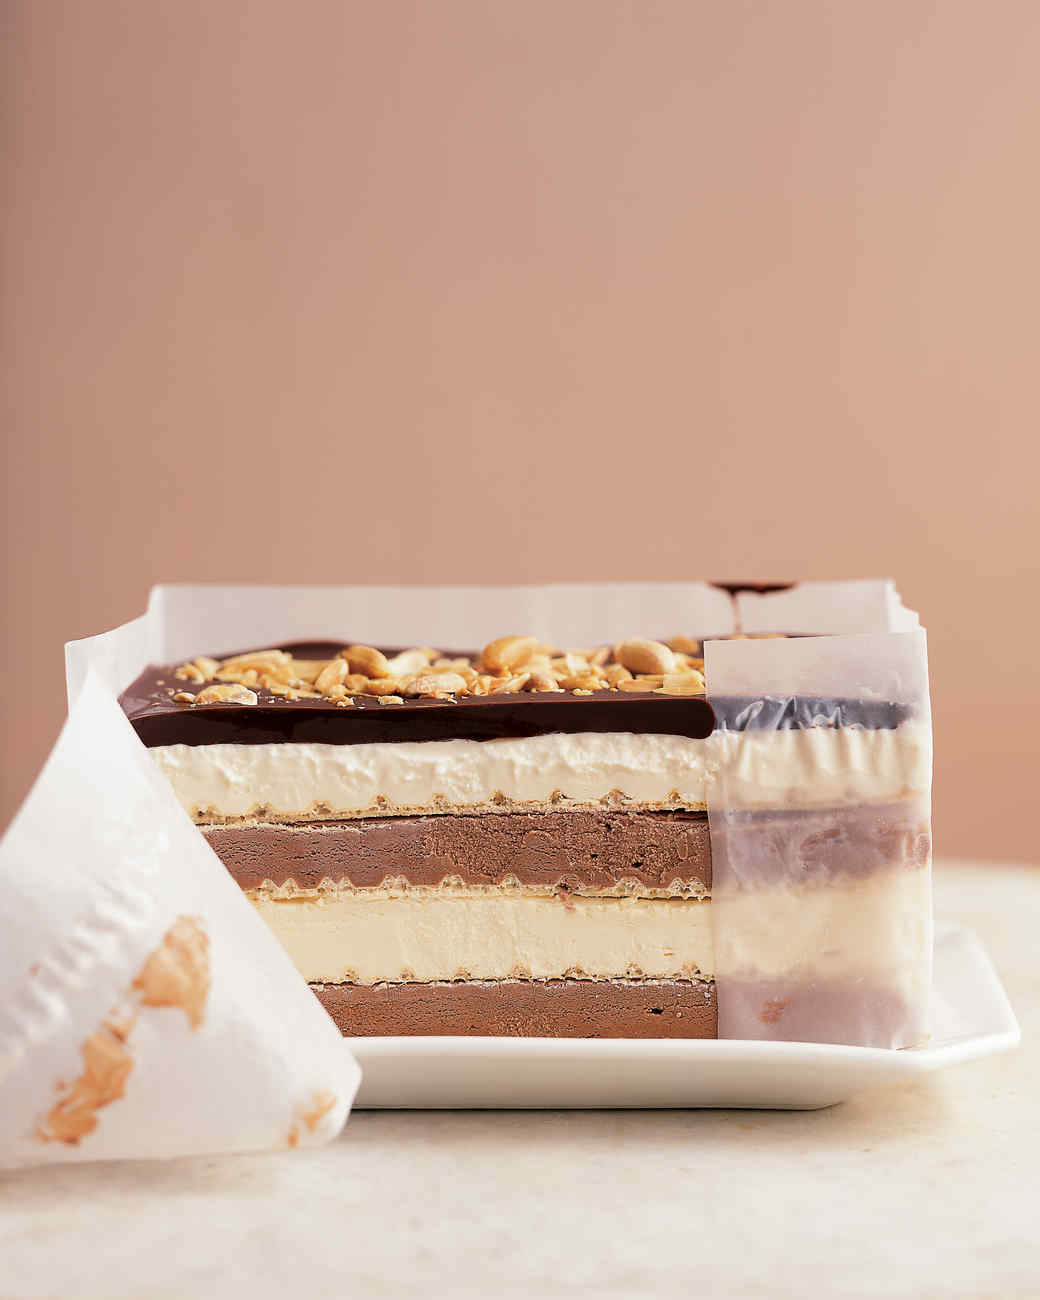 cakes_00141_t.jpg